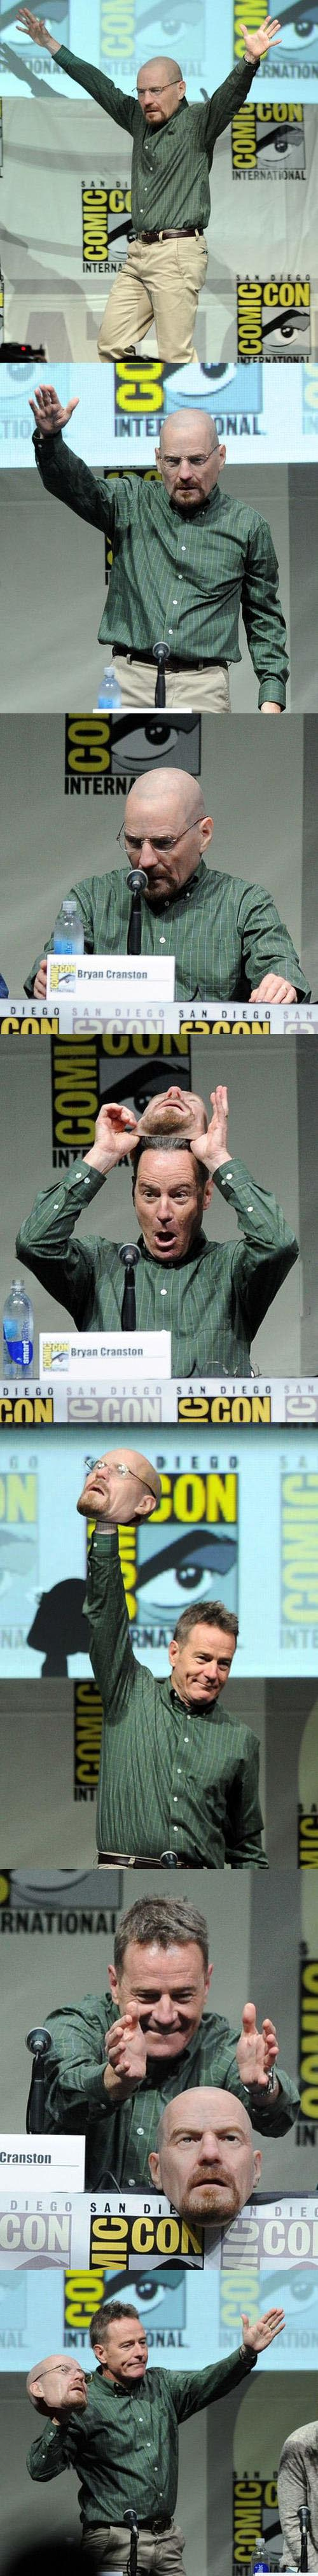 Bryan Cranston panel breaking bad